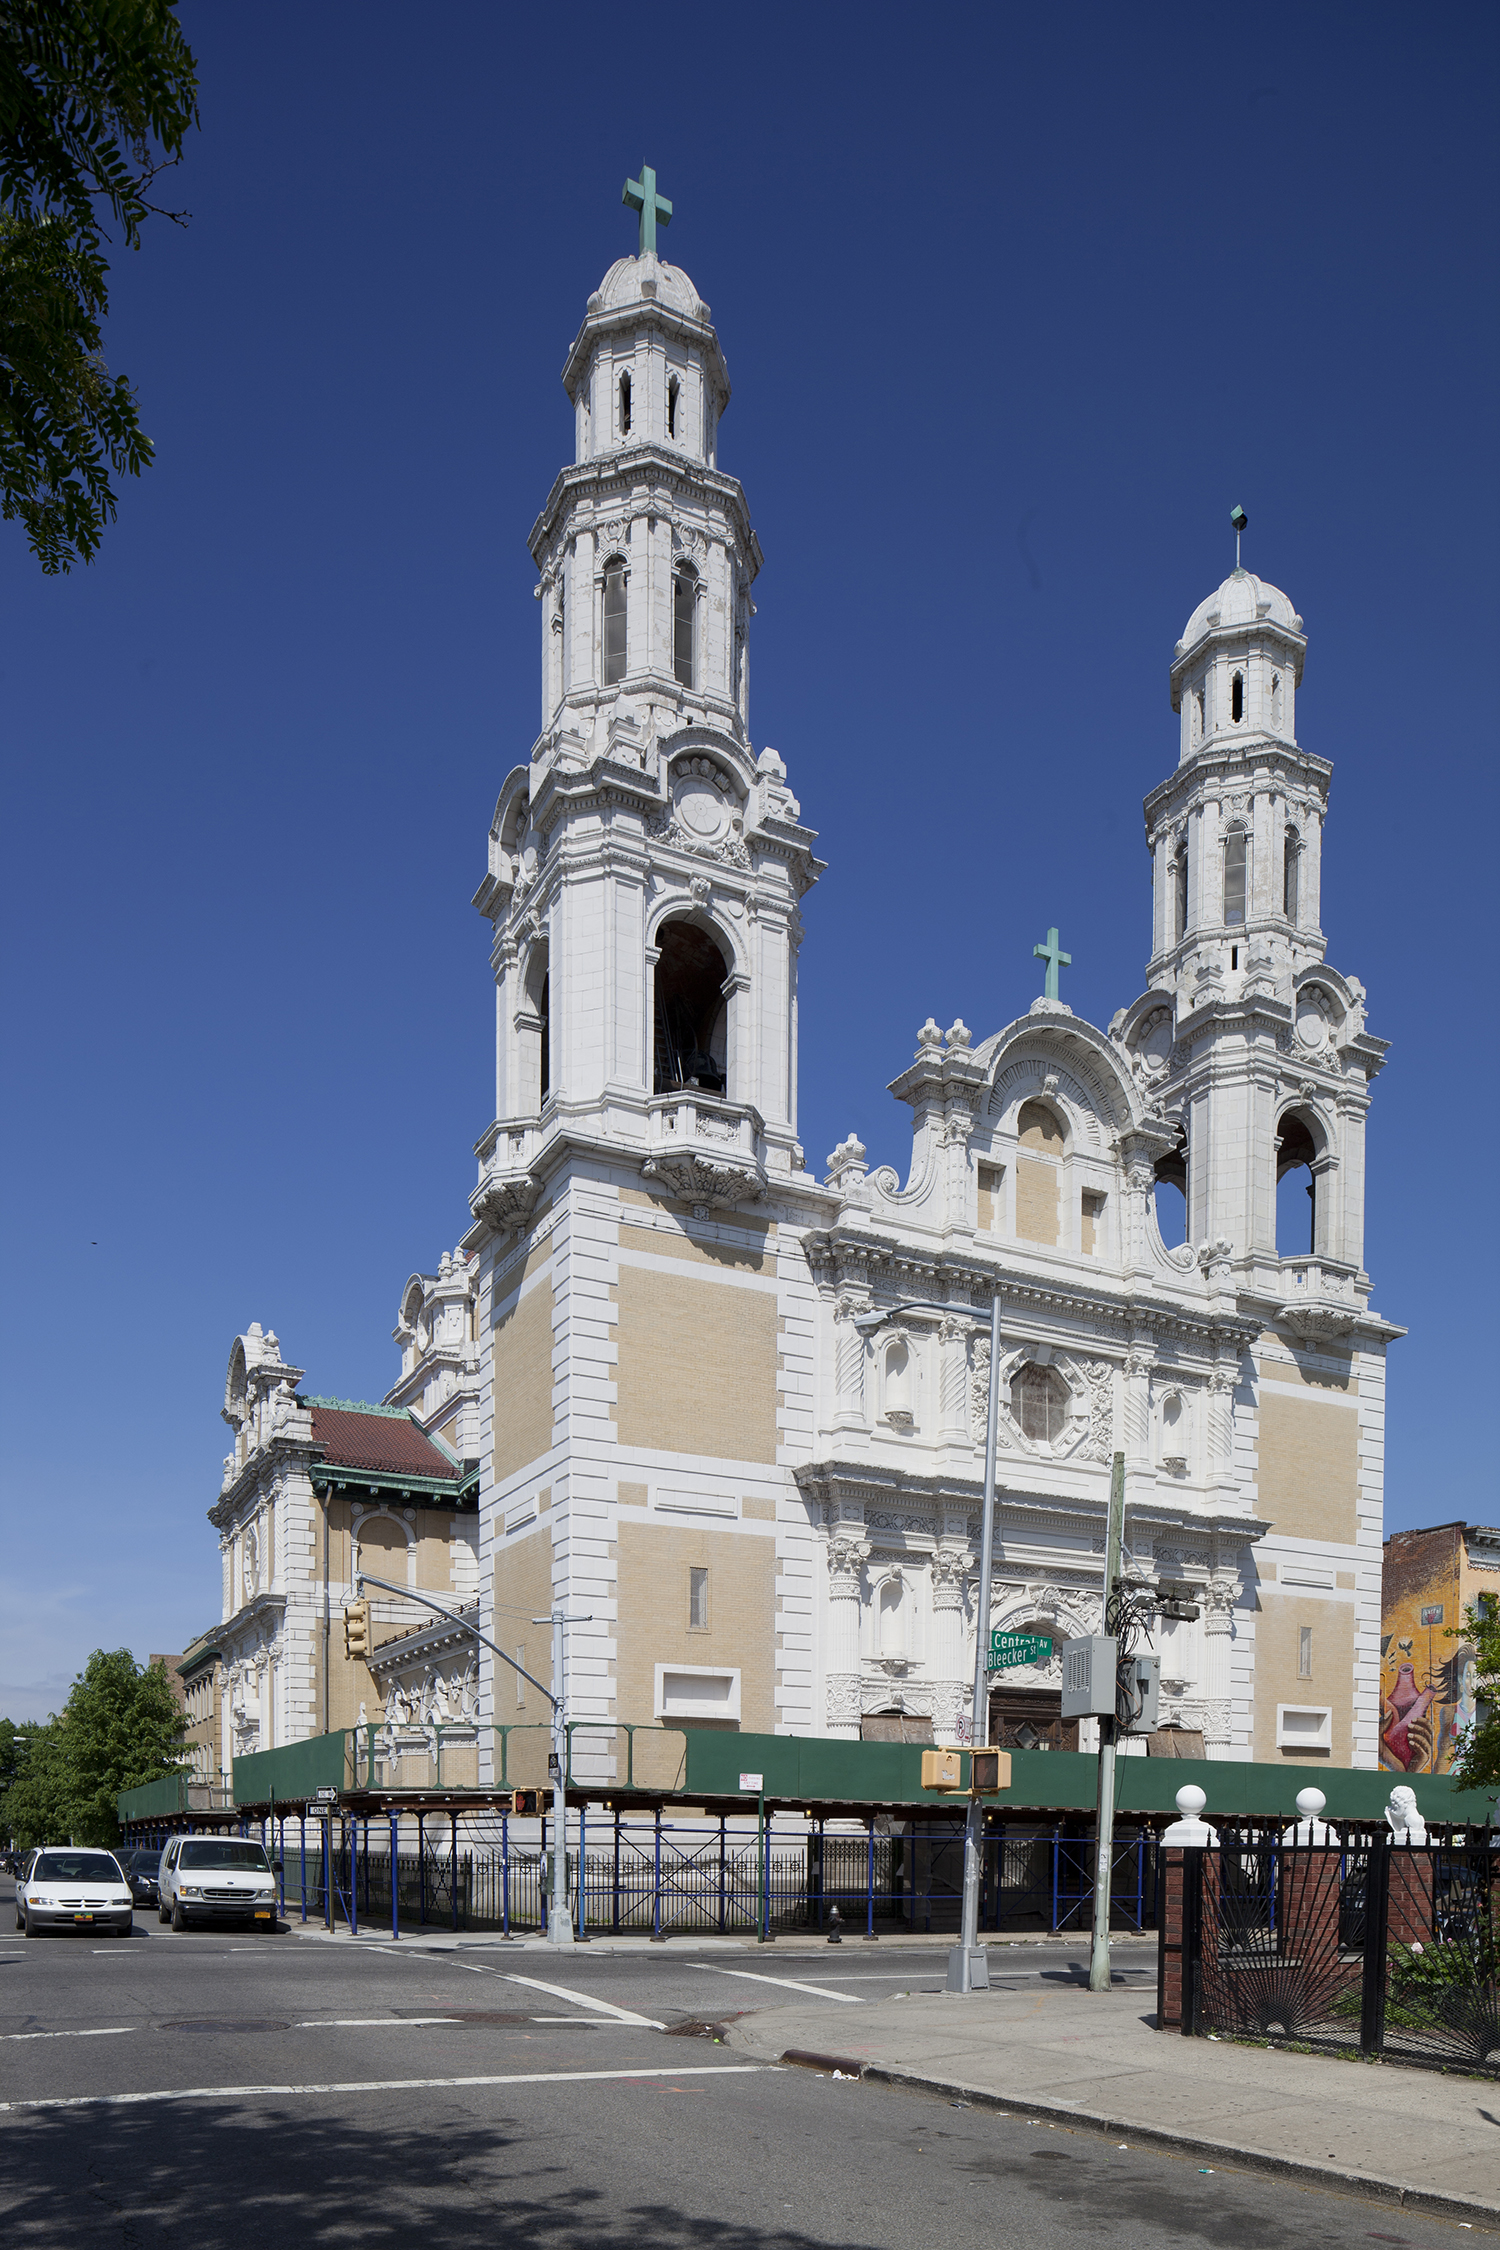 St. Barbara's Roman Catholic Church, 138 Bleecker Street. LPC photo.